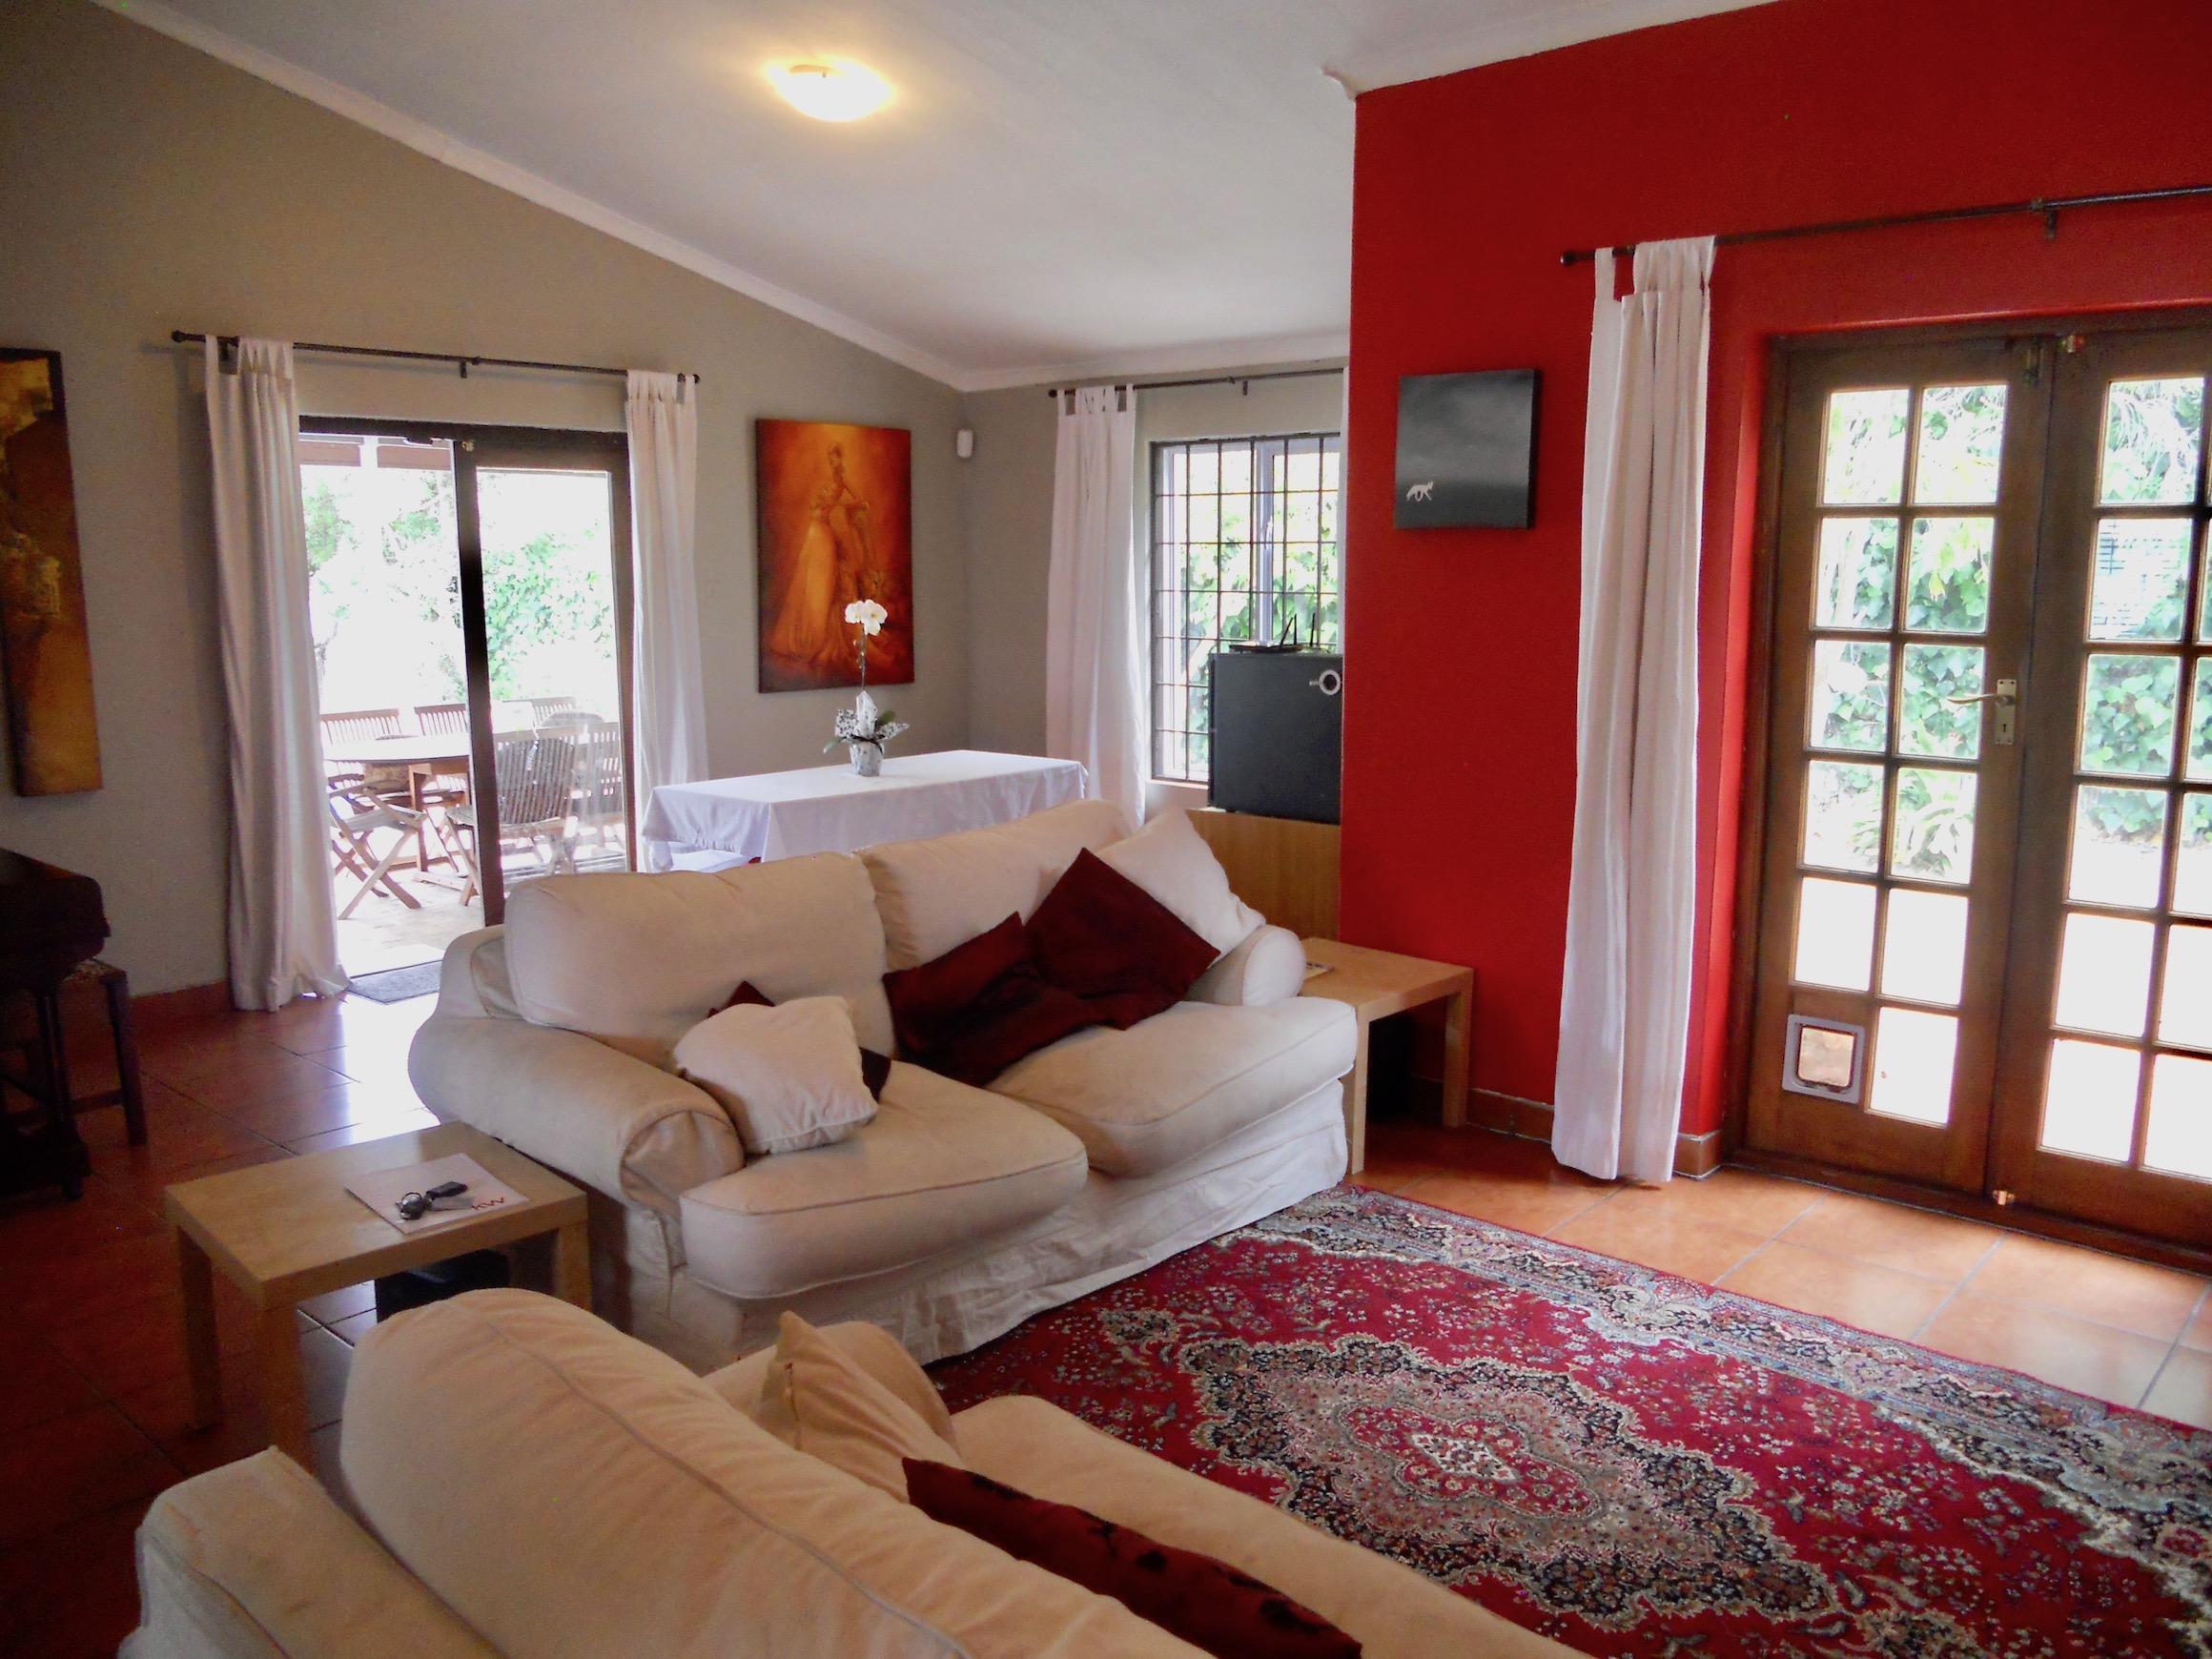 3 BedroomHouse For Sale In Marina Da Gama